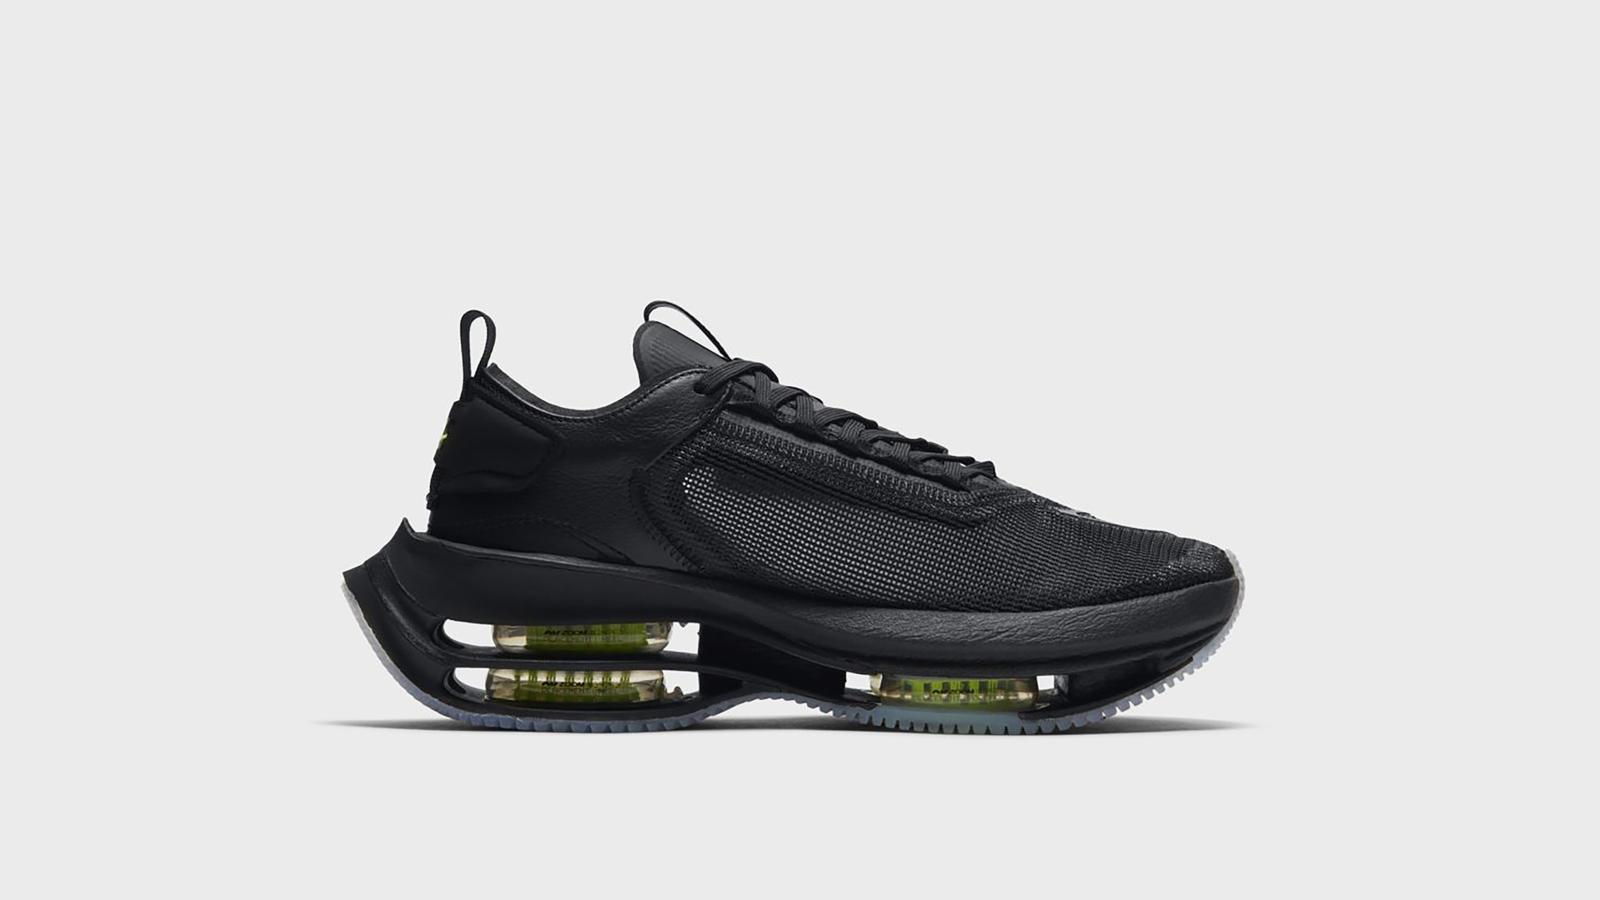 Nike、新作ウィメンズモデル発売 レース向けシューズ参考に